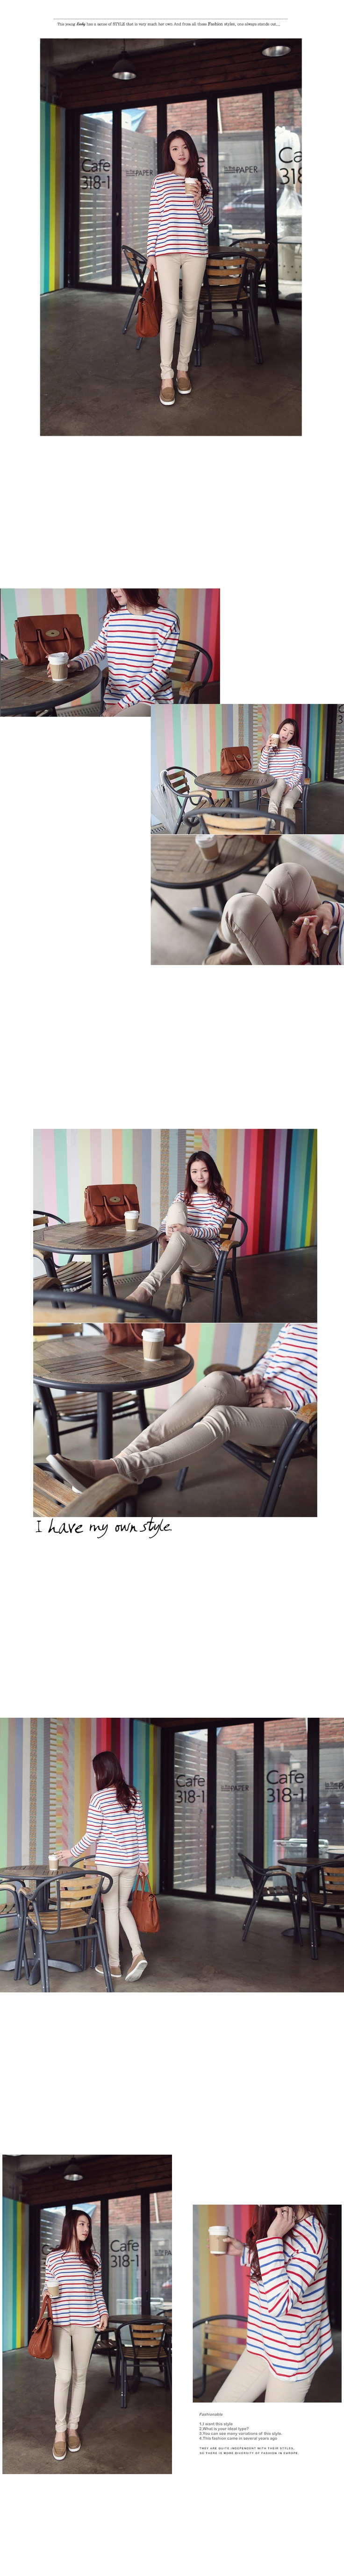 Jual jeans Korea Buy Sell Authentic Korean Skirt Fashion Online Sugarfun Skinny Jeans LFBTM_078_1261 $84 #malaysianbabes #malaysianshopper #malaysiashopper #malaysiashopping #malaysianshopping #onlineshop #onlineshopping #sggirls #koreafashion #koreanfashion #fashion #pikomiko #shoppingspree #spree #poslaju #posmalaysia #malaysiashop